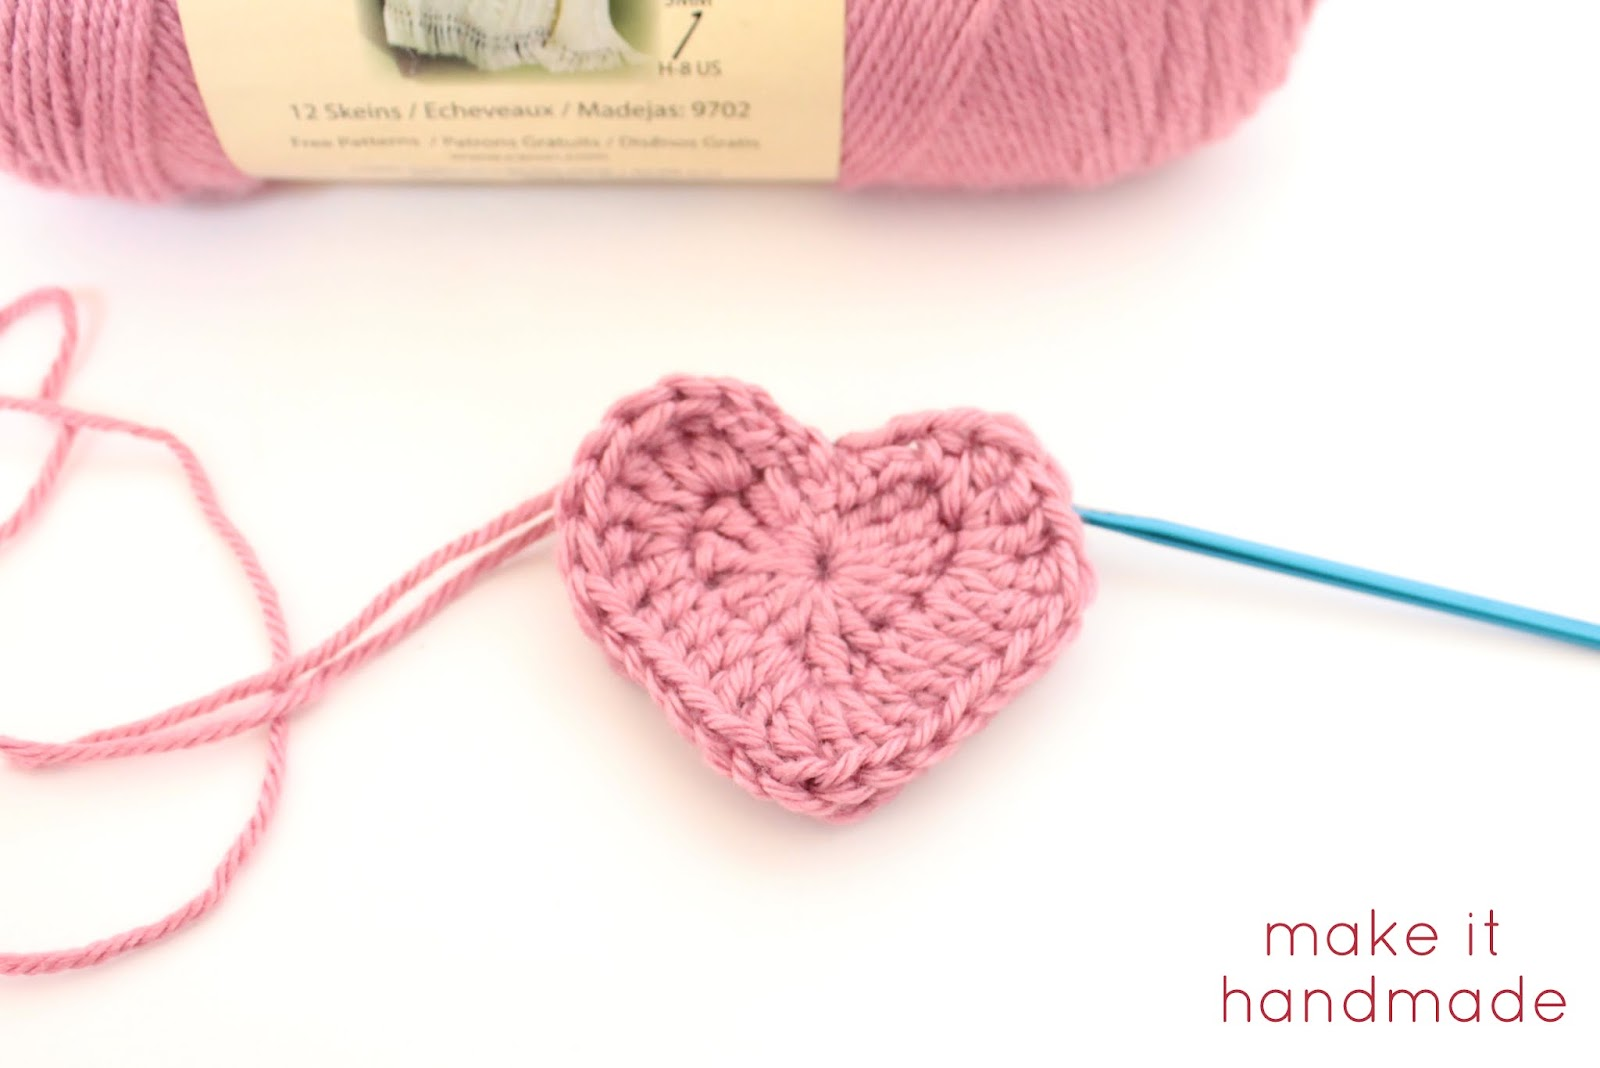 Make It Handmade: Crochet Heart Magnets